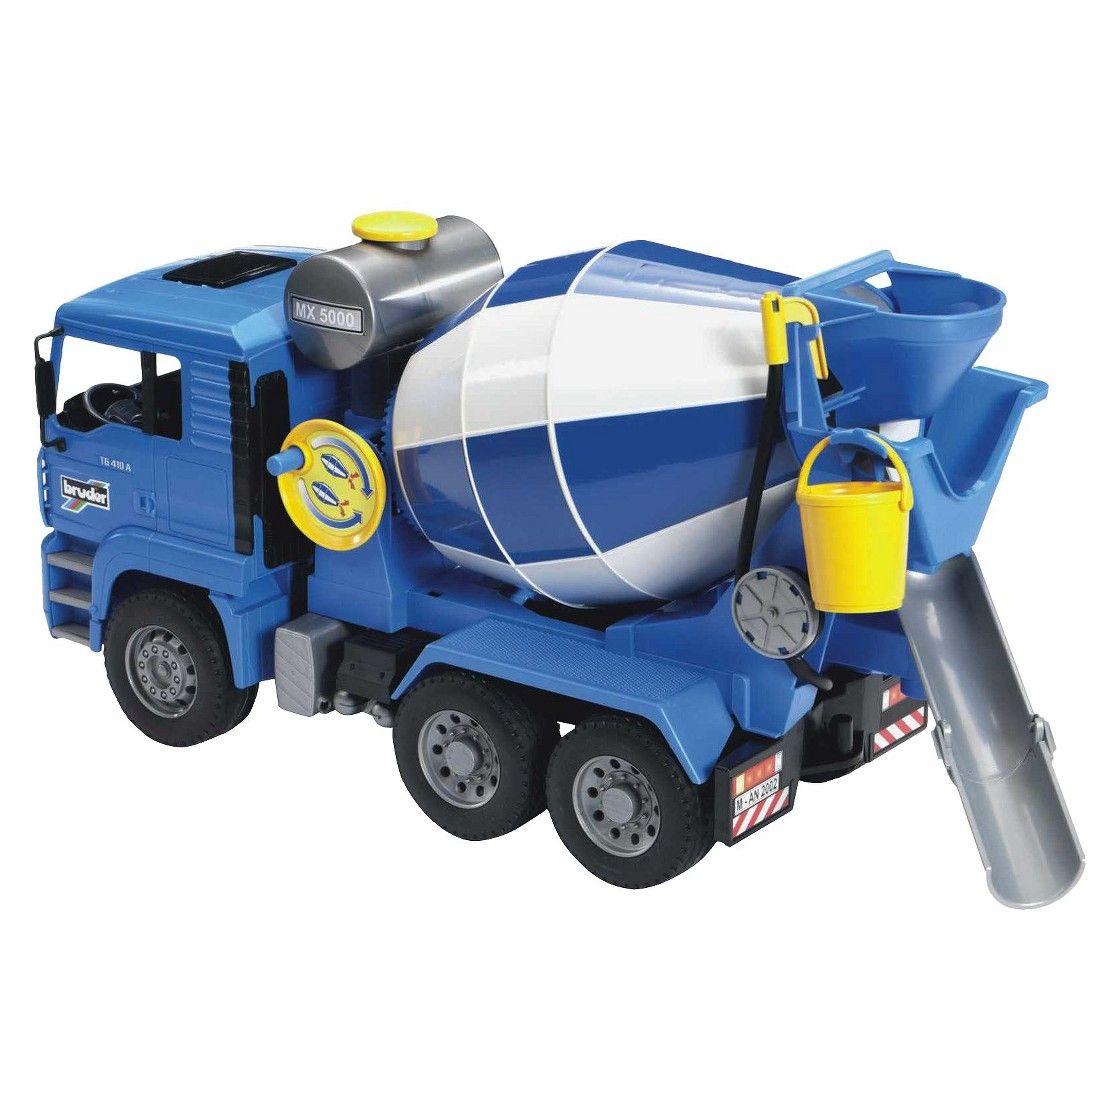 Bruder Toys MAN Cement Mixer Cement mixers, Cement mixer